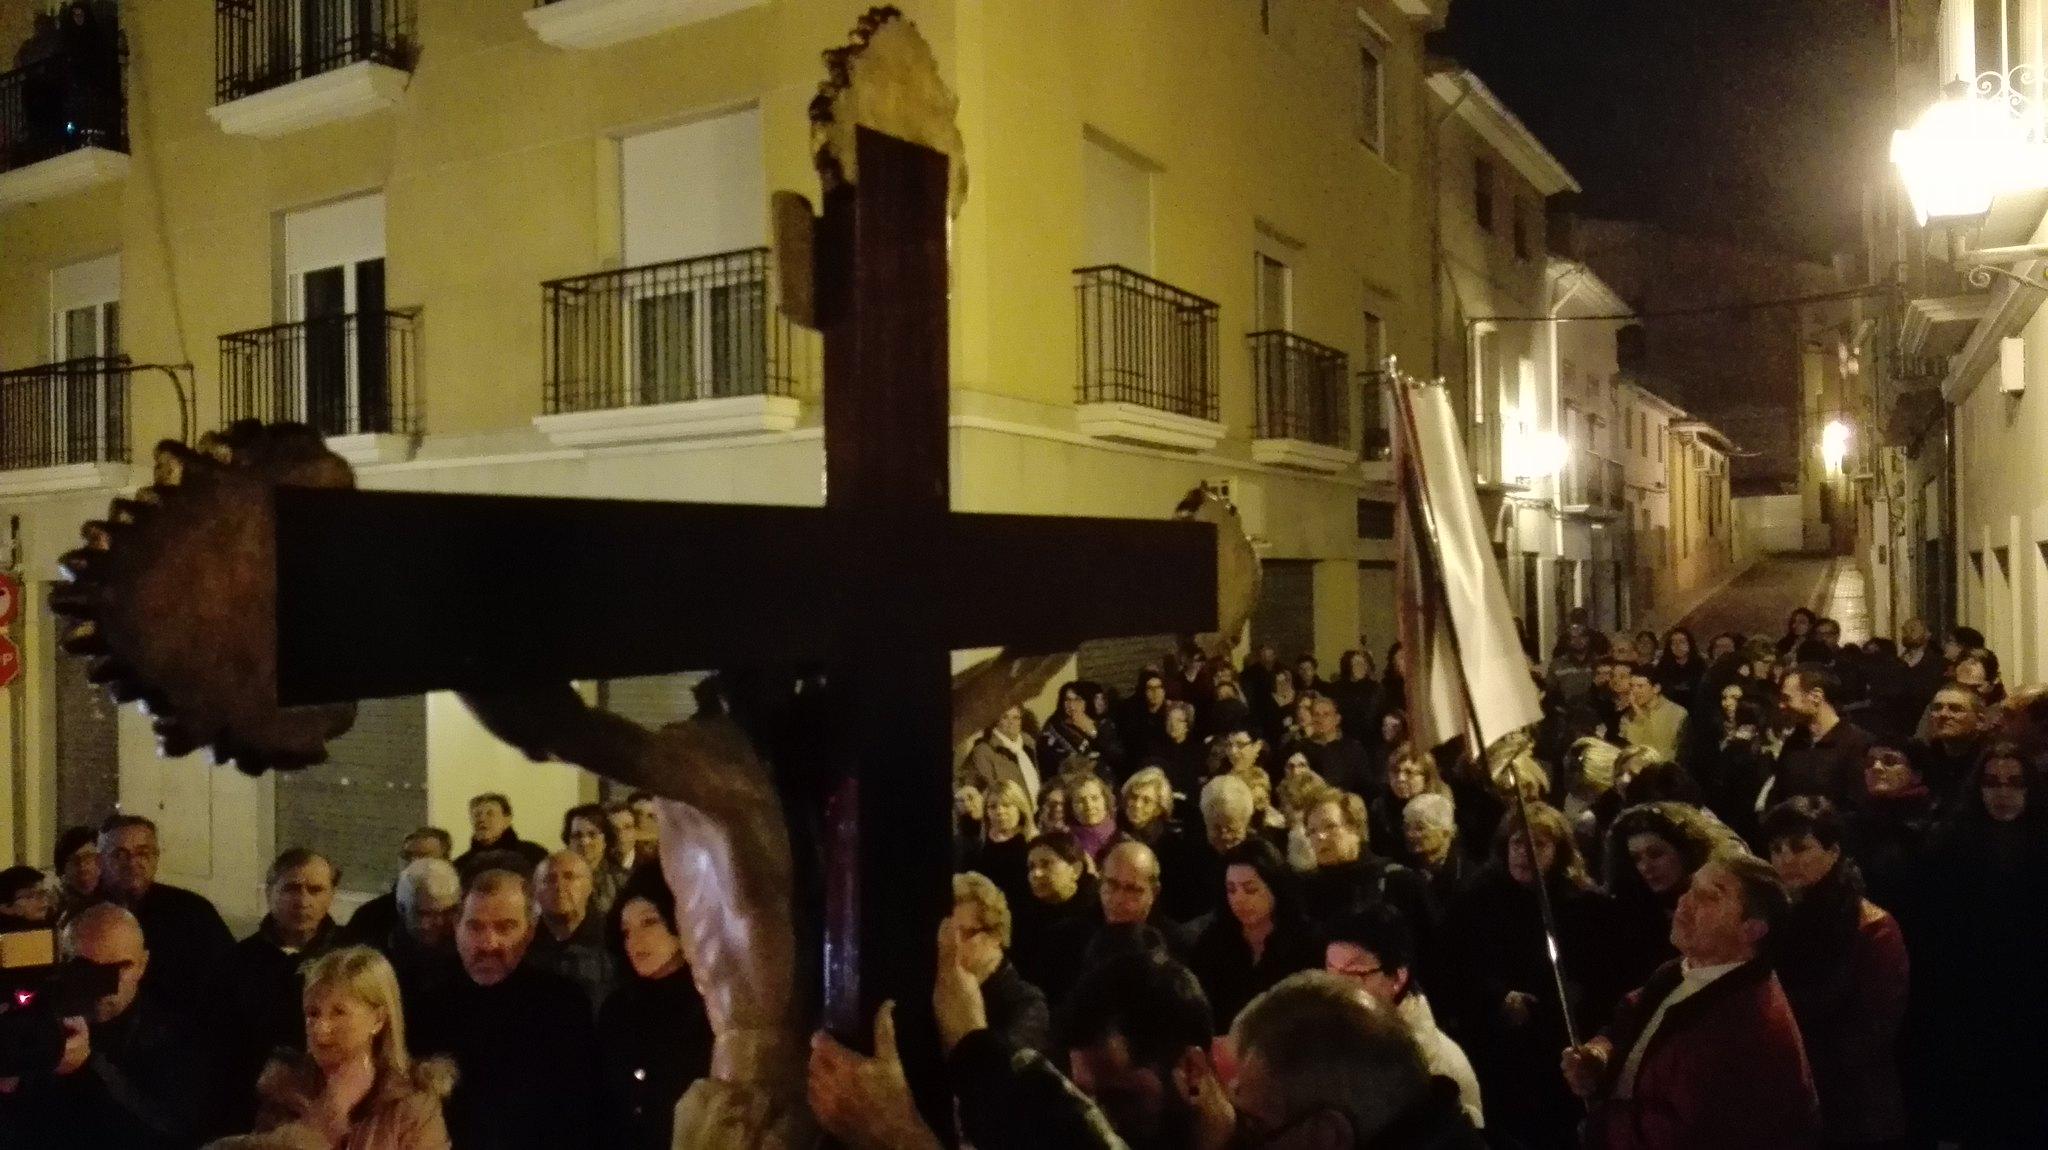 (2016-03-18) - VII Vía Crucis nocturno - Javier Romero Ripoll (113)